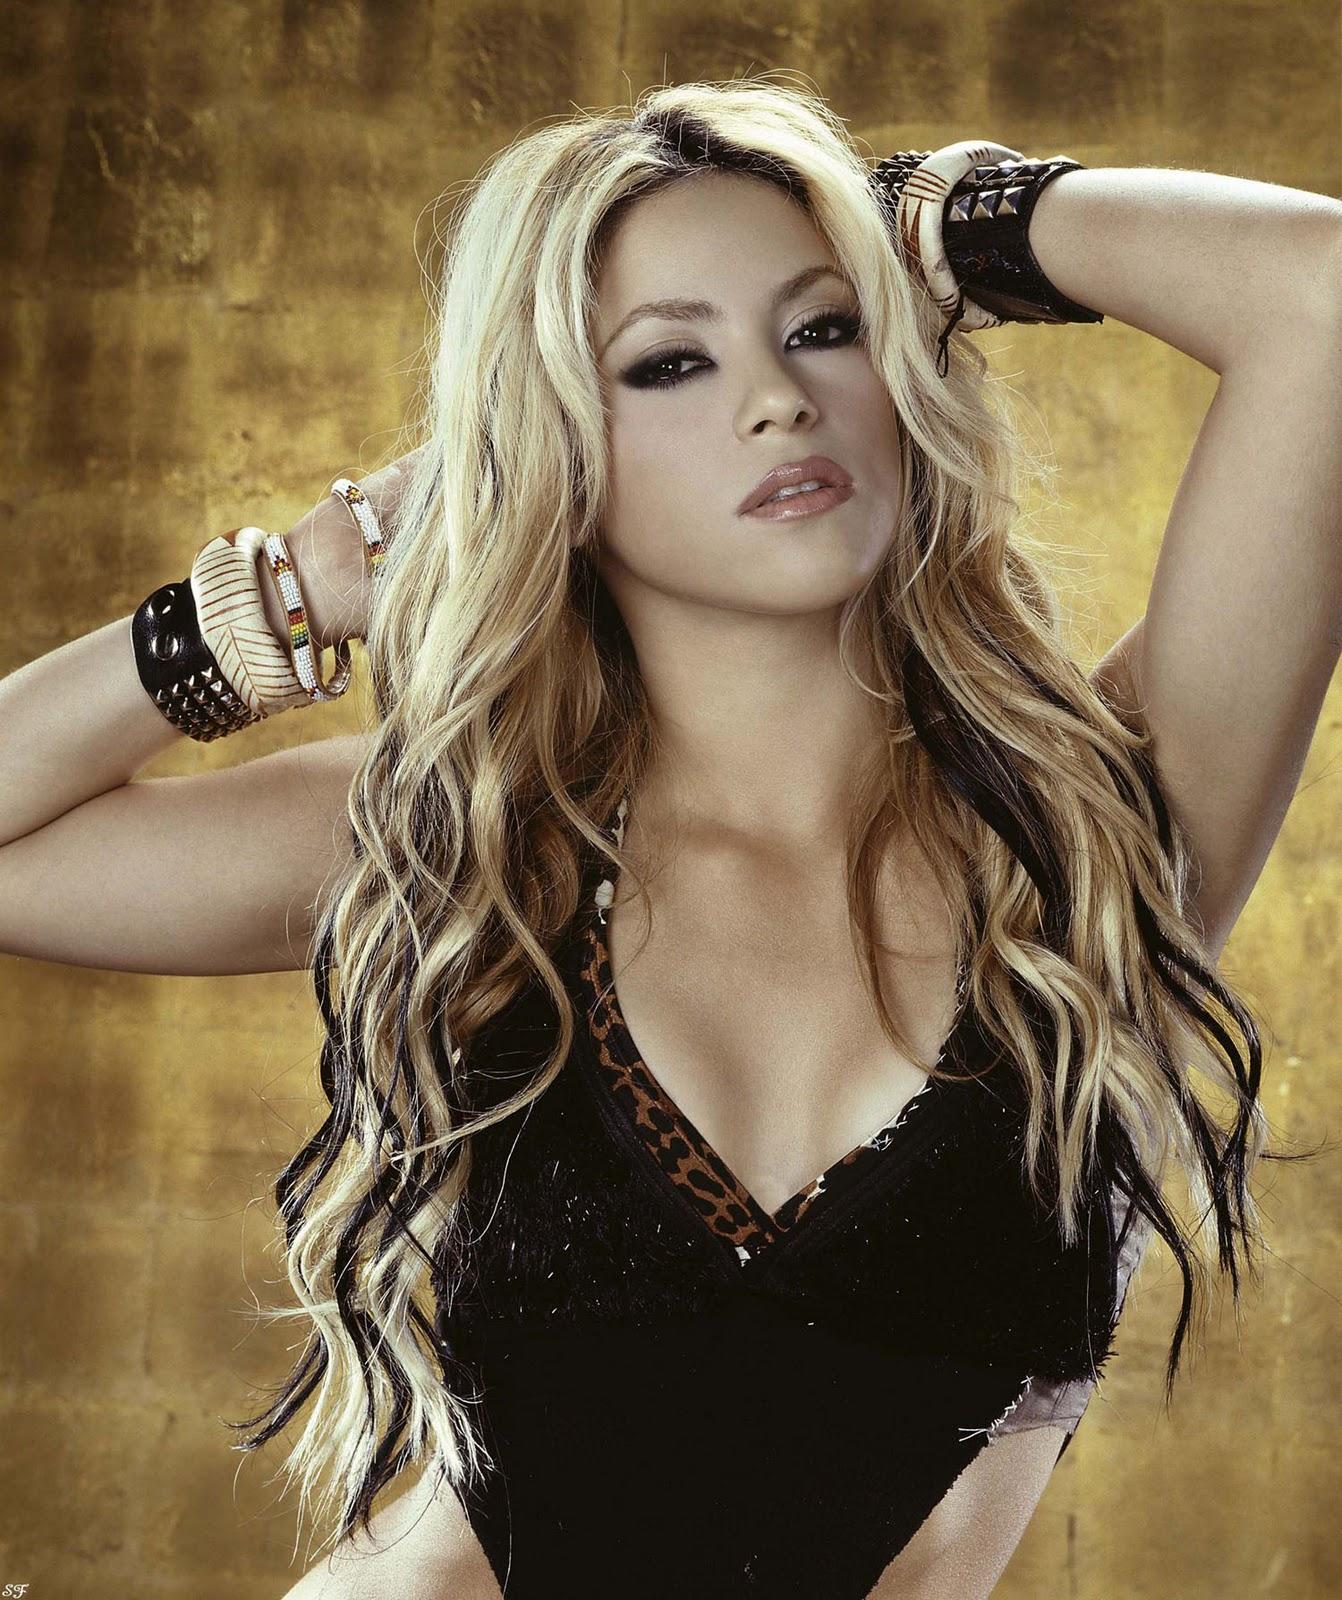 Shakira Hot Pics In Bikini | Hot Celebrity Photos Pictures ... Shakira